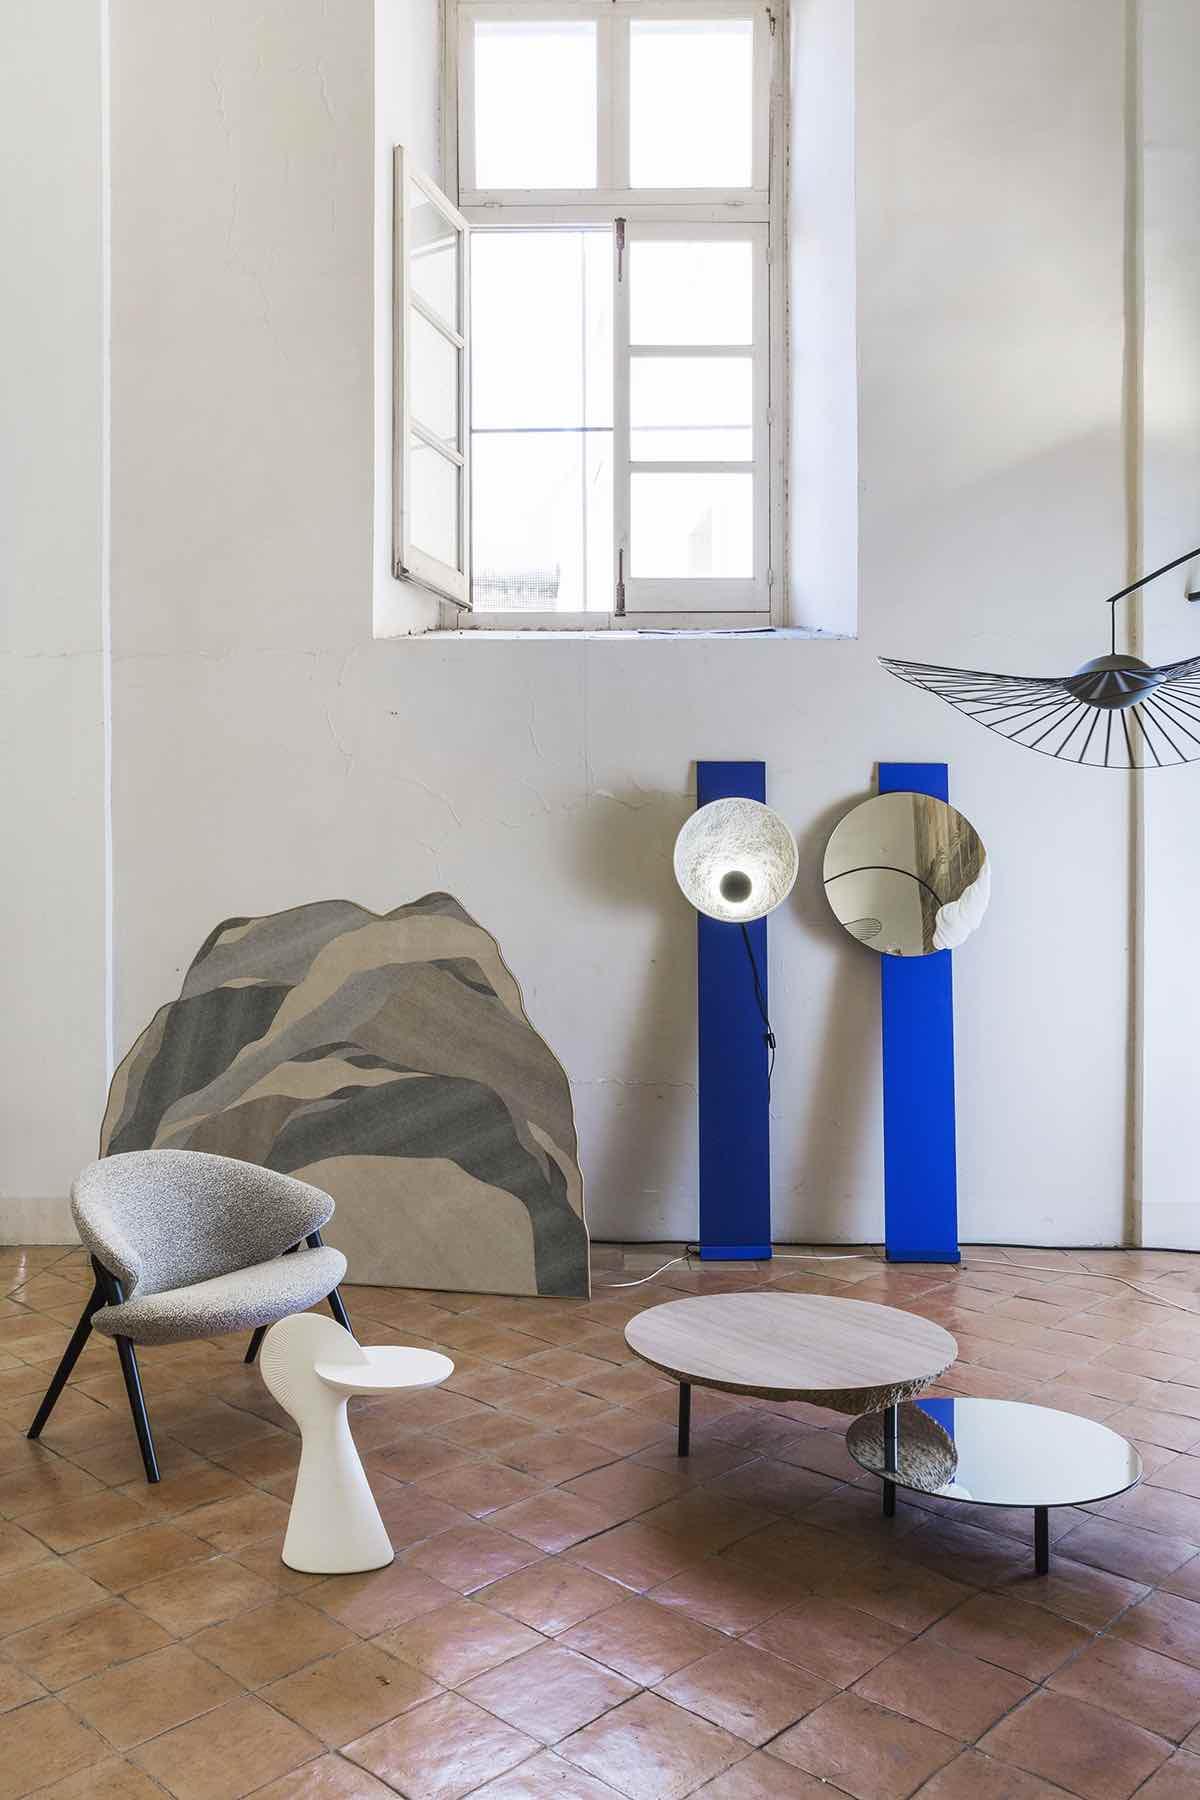 EDIT Napoli 2020 - Constance Guisset Studio ©Serena Eller Vainicher